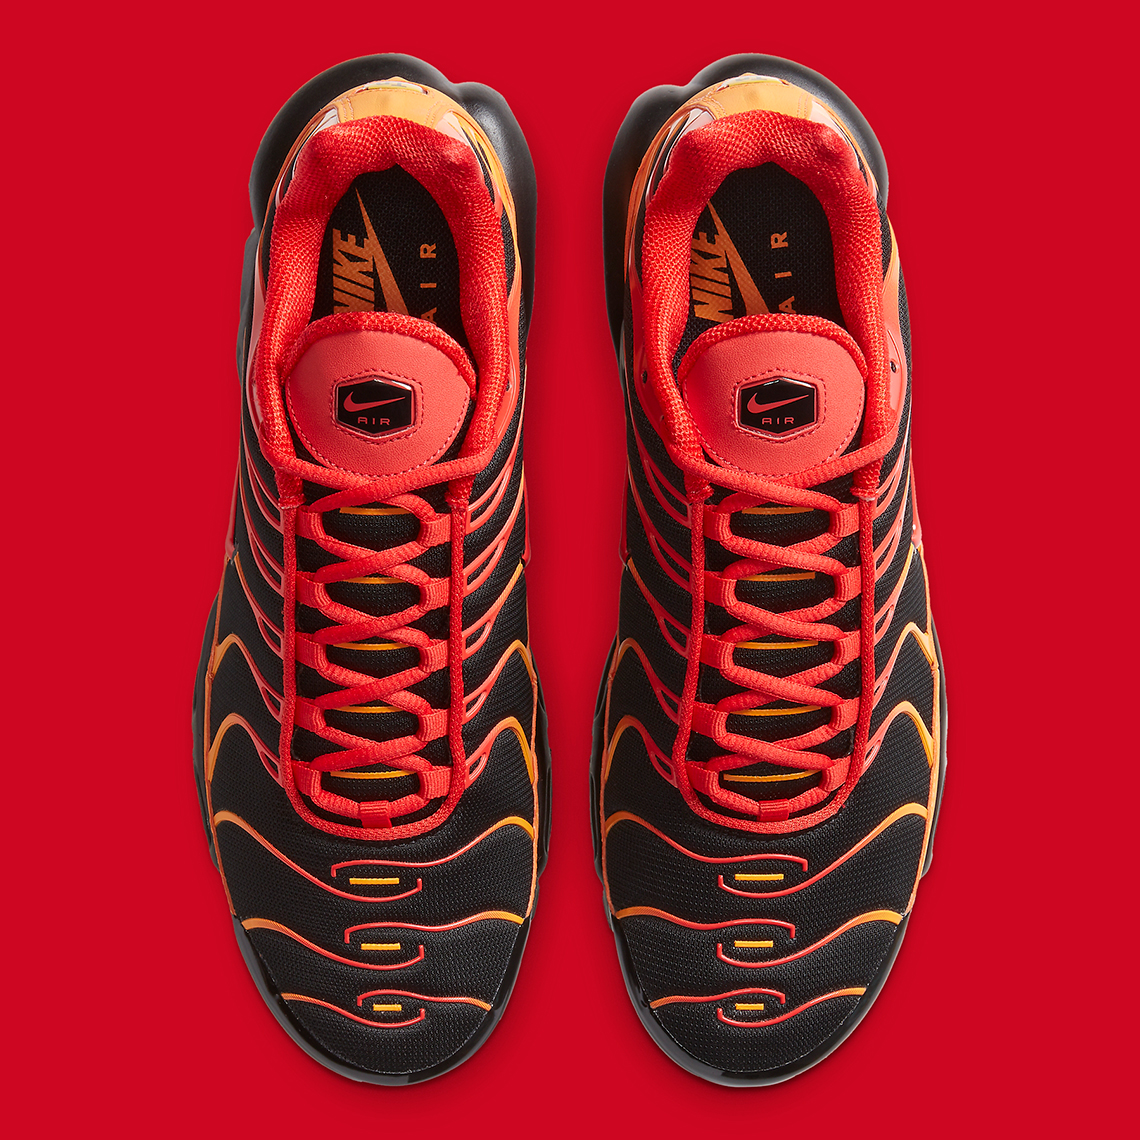 Nike Air Max Plus Volcano DA1514-001 Release Info | SneakerNews.com